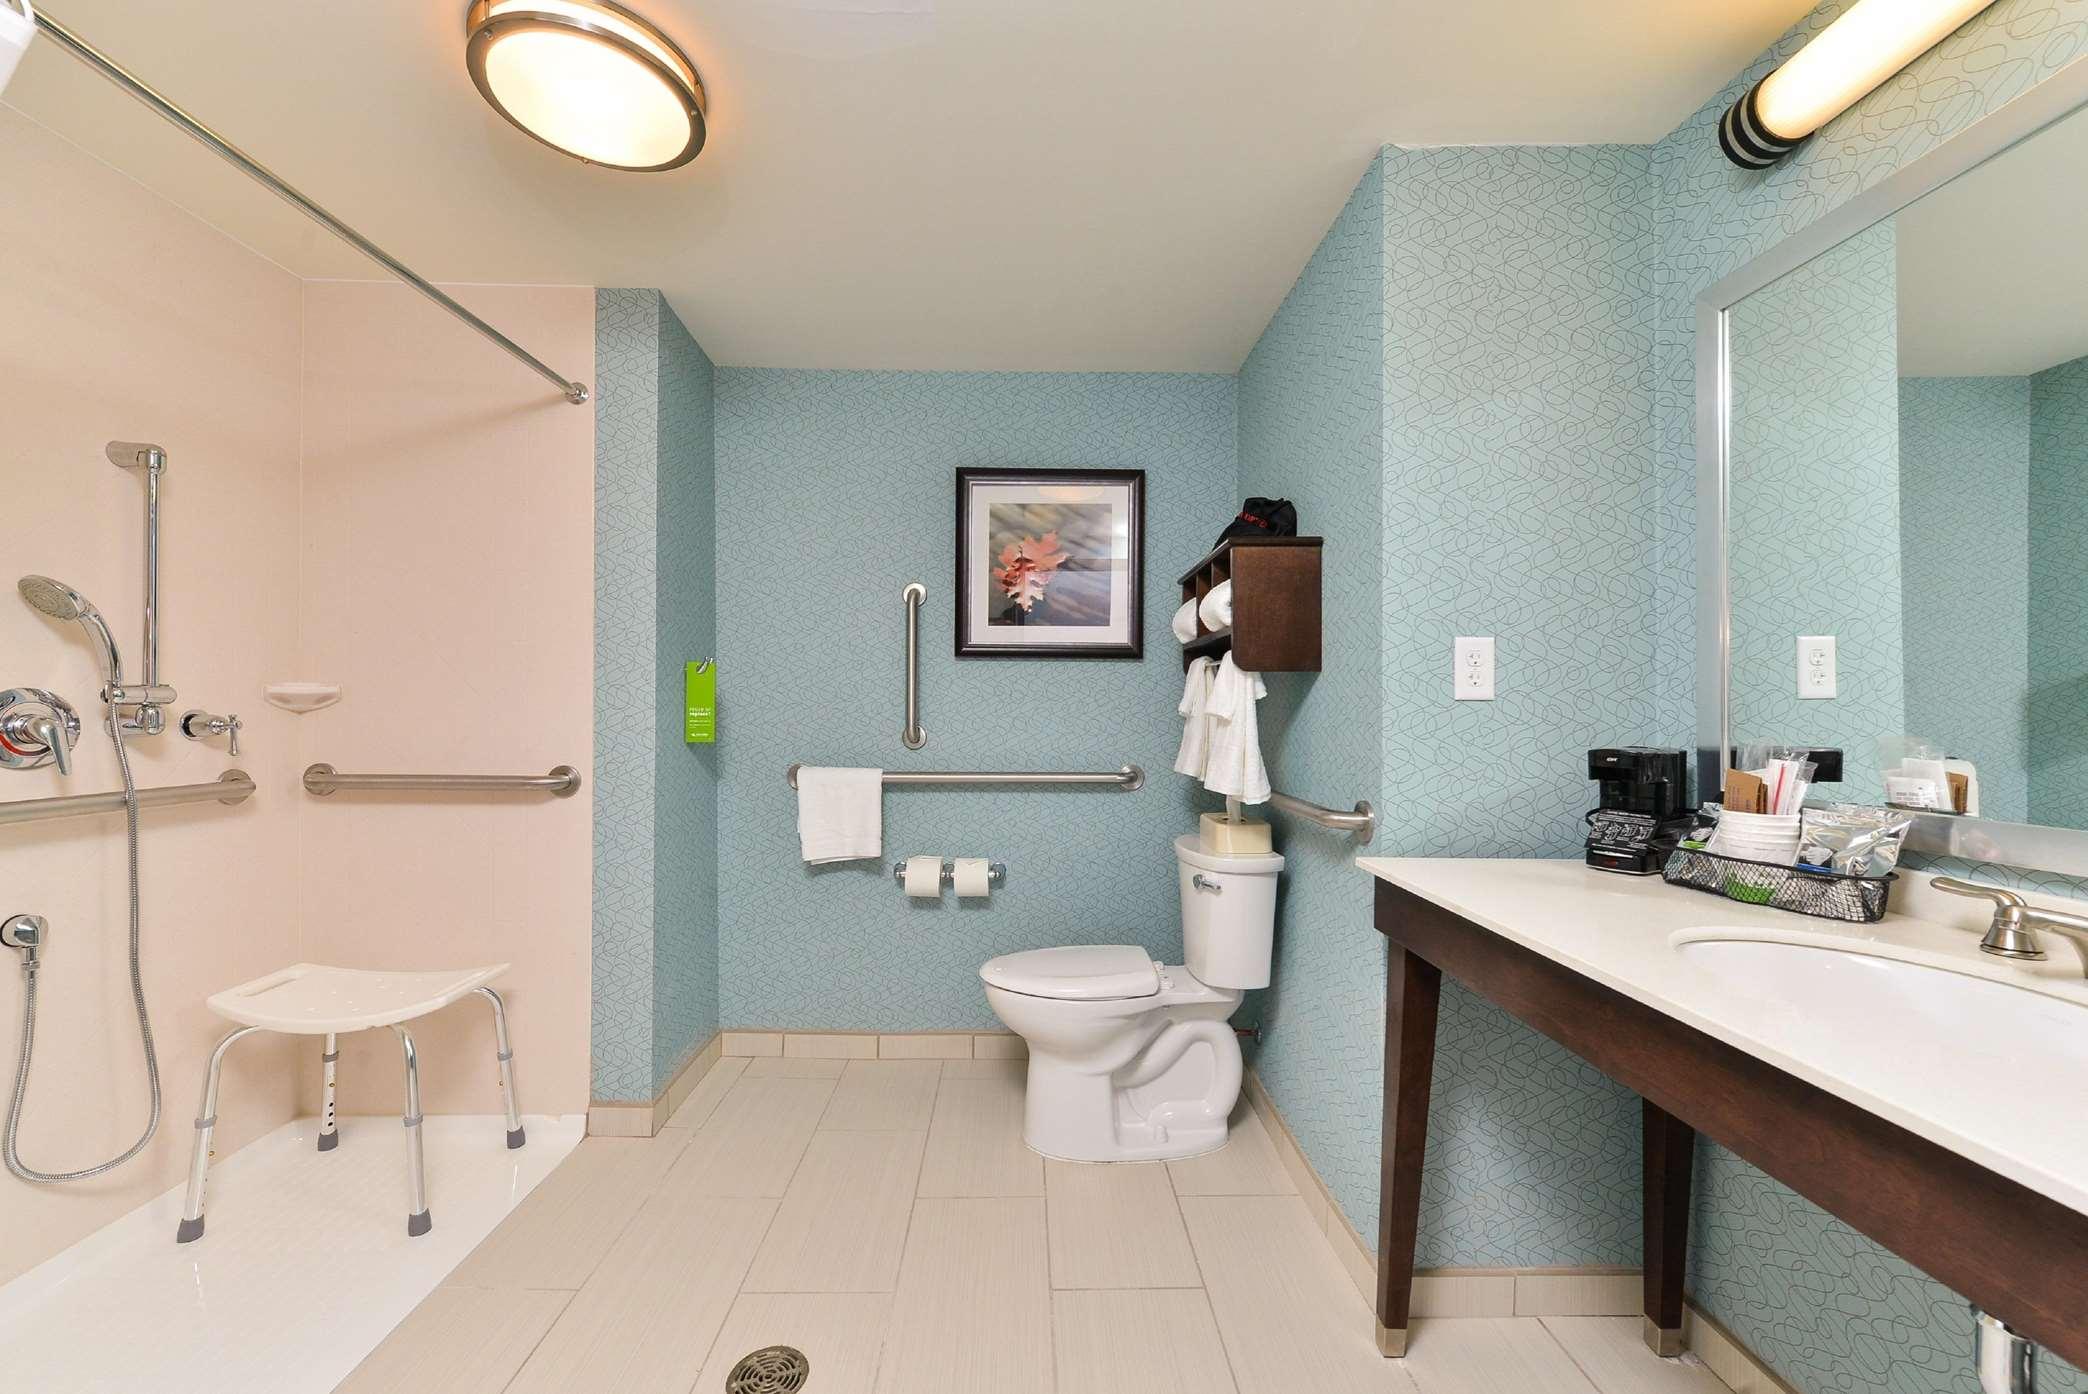 Hampton Inn Corning/Painted Post image 29